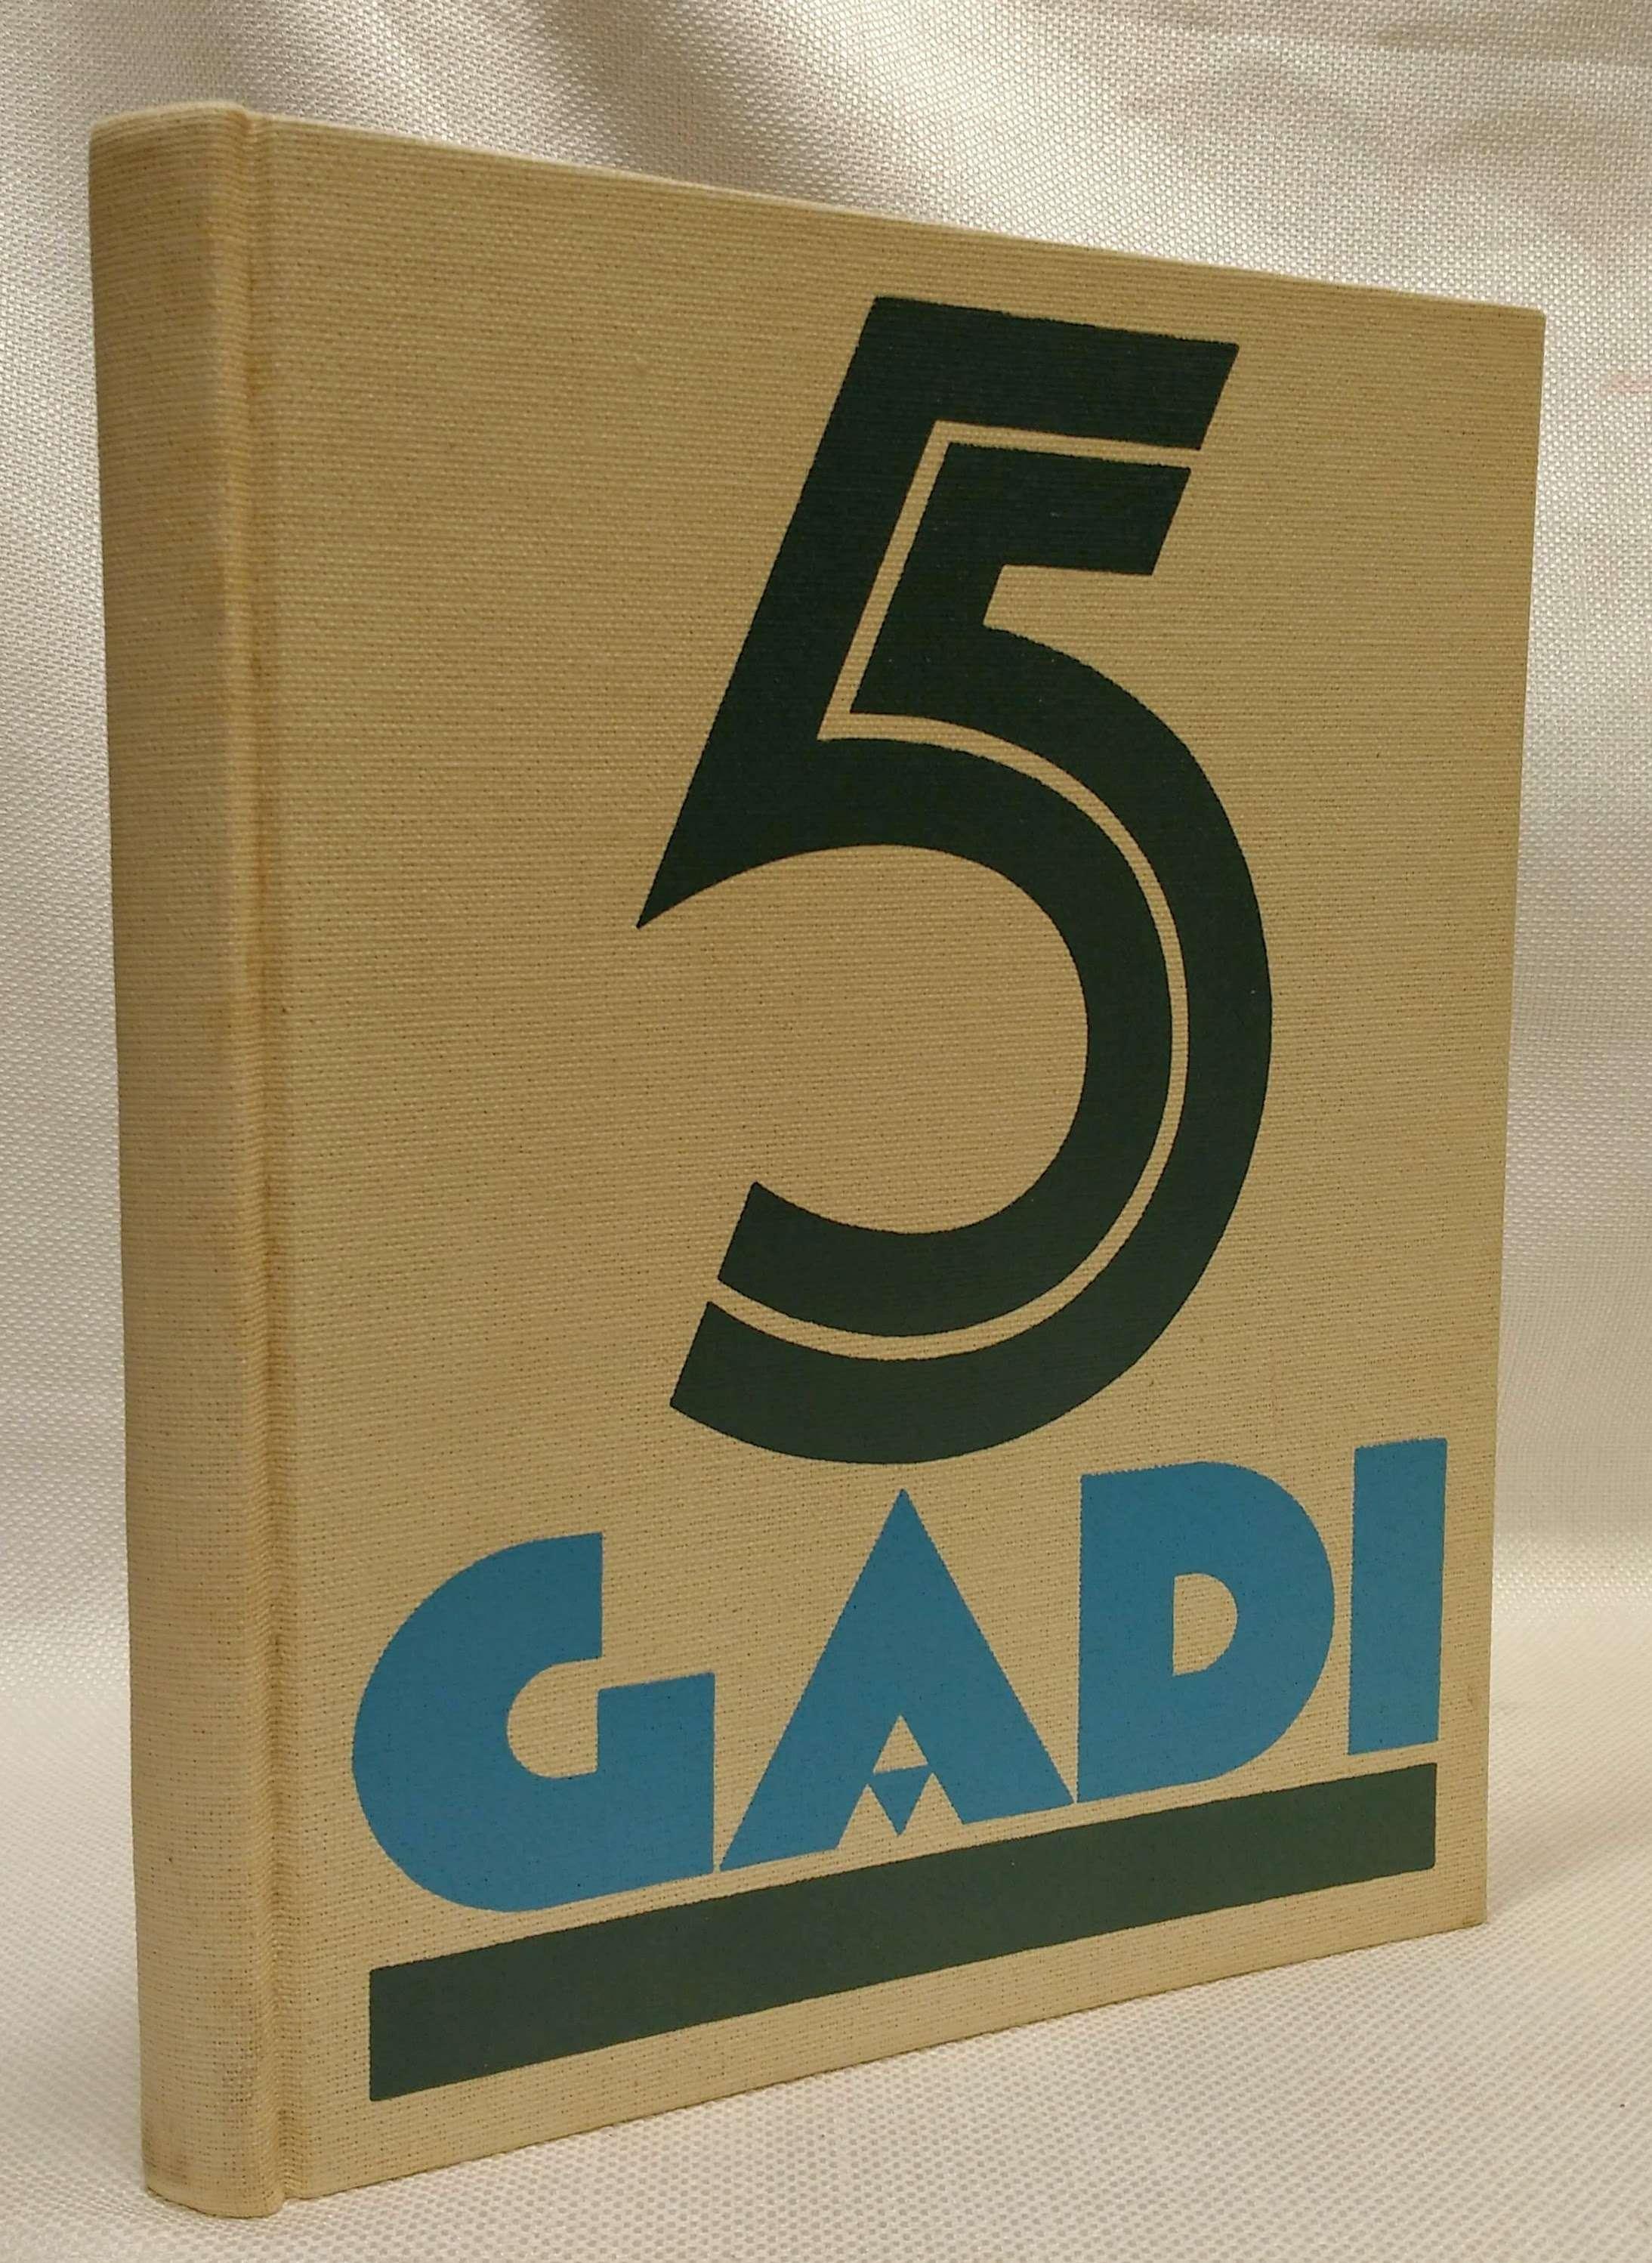 Pieci Gadi [5 Gadi]: 1934-1939, Berzins-Valdess, R. [ed.]; Vidbergs, S. [ed.]